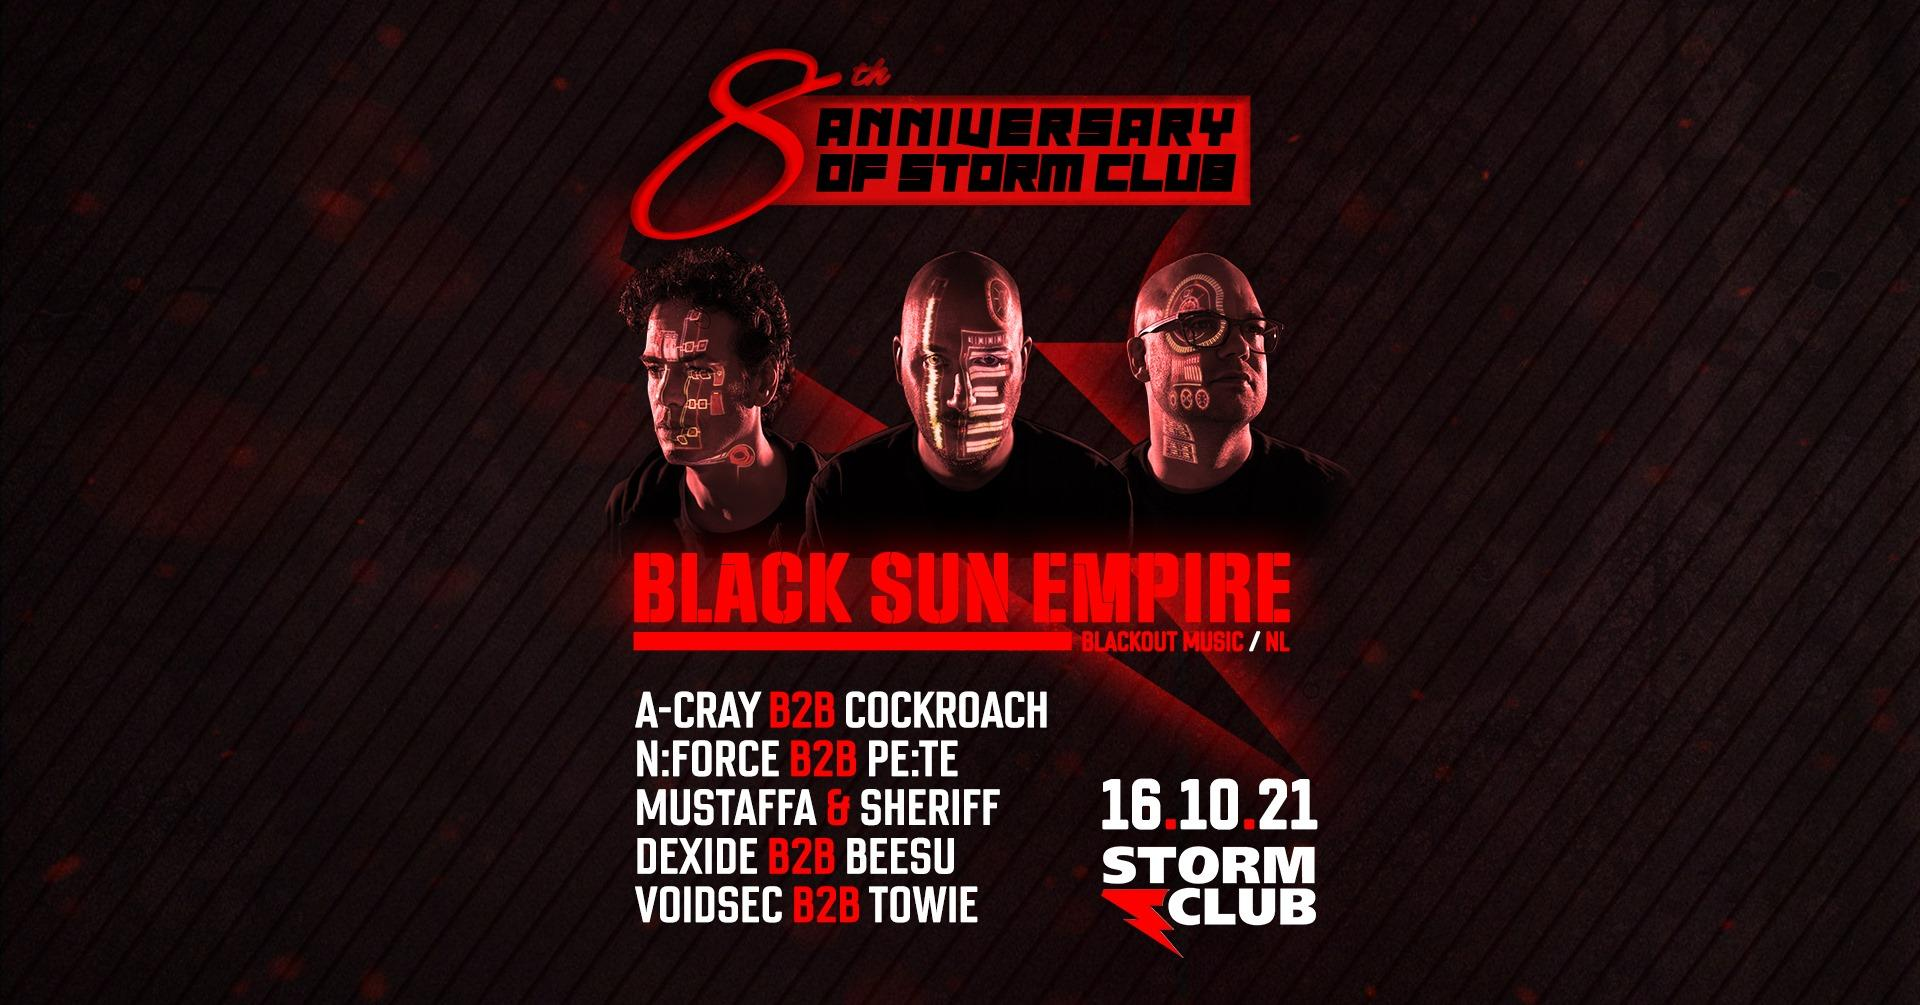 Black Sun Empire + support: A-Cray + další